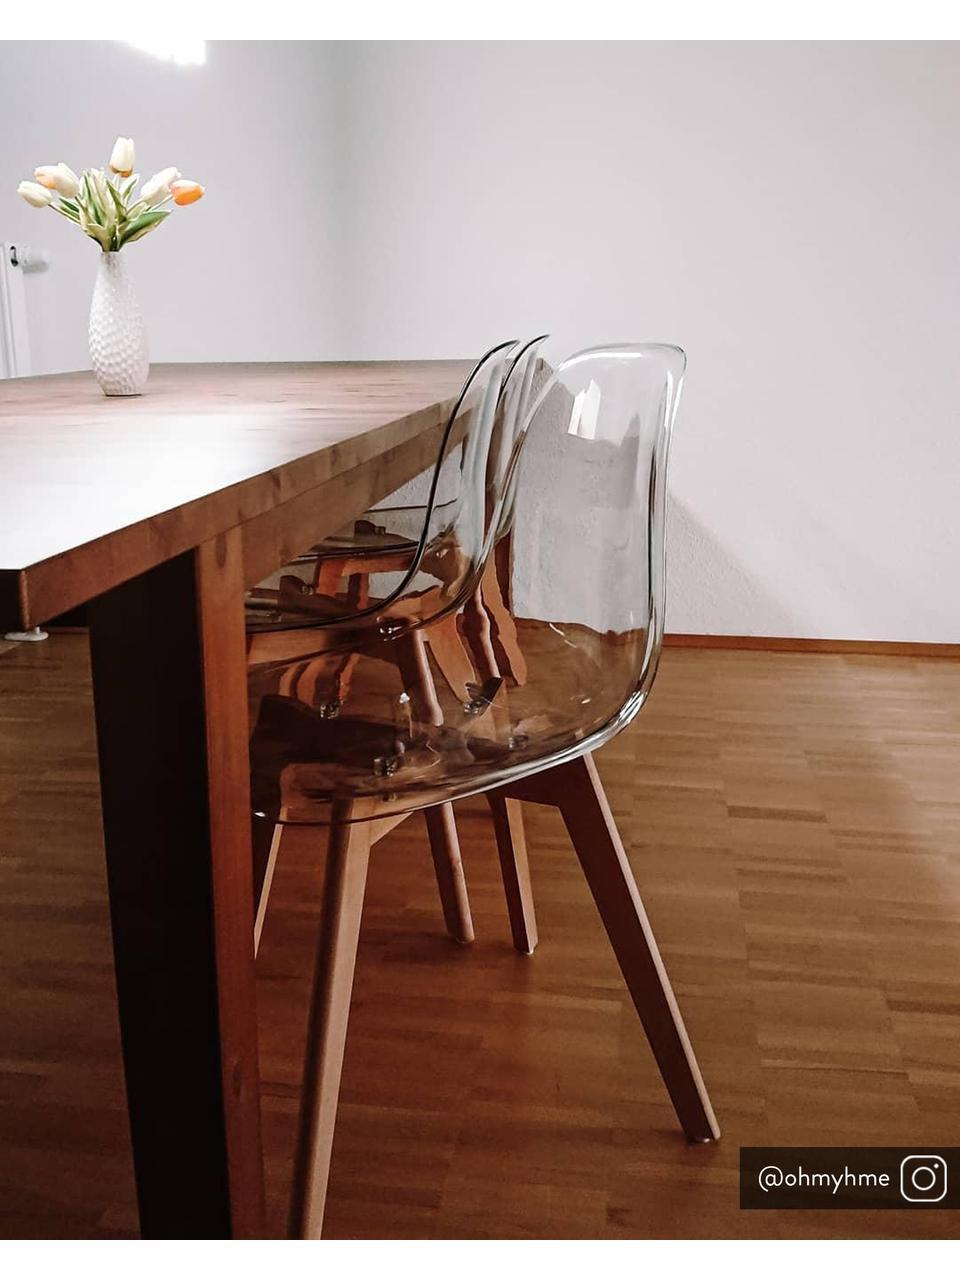 Transparente Stühle Easy, 2 Stück, Sitzfläche: Kunststoff, Beine: Buchenholz, Transparent, Buchenholz, B 51 x T 47 cm